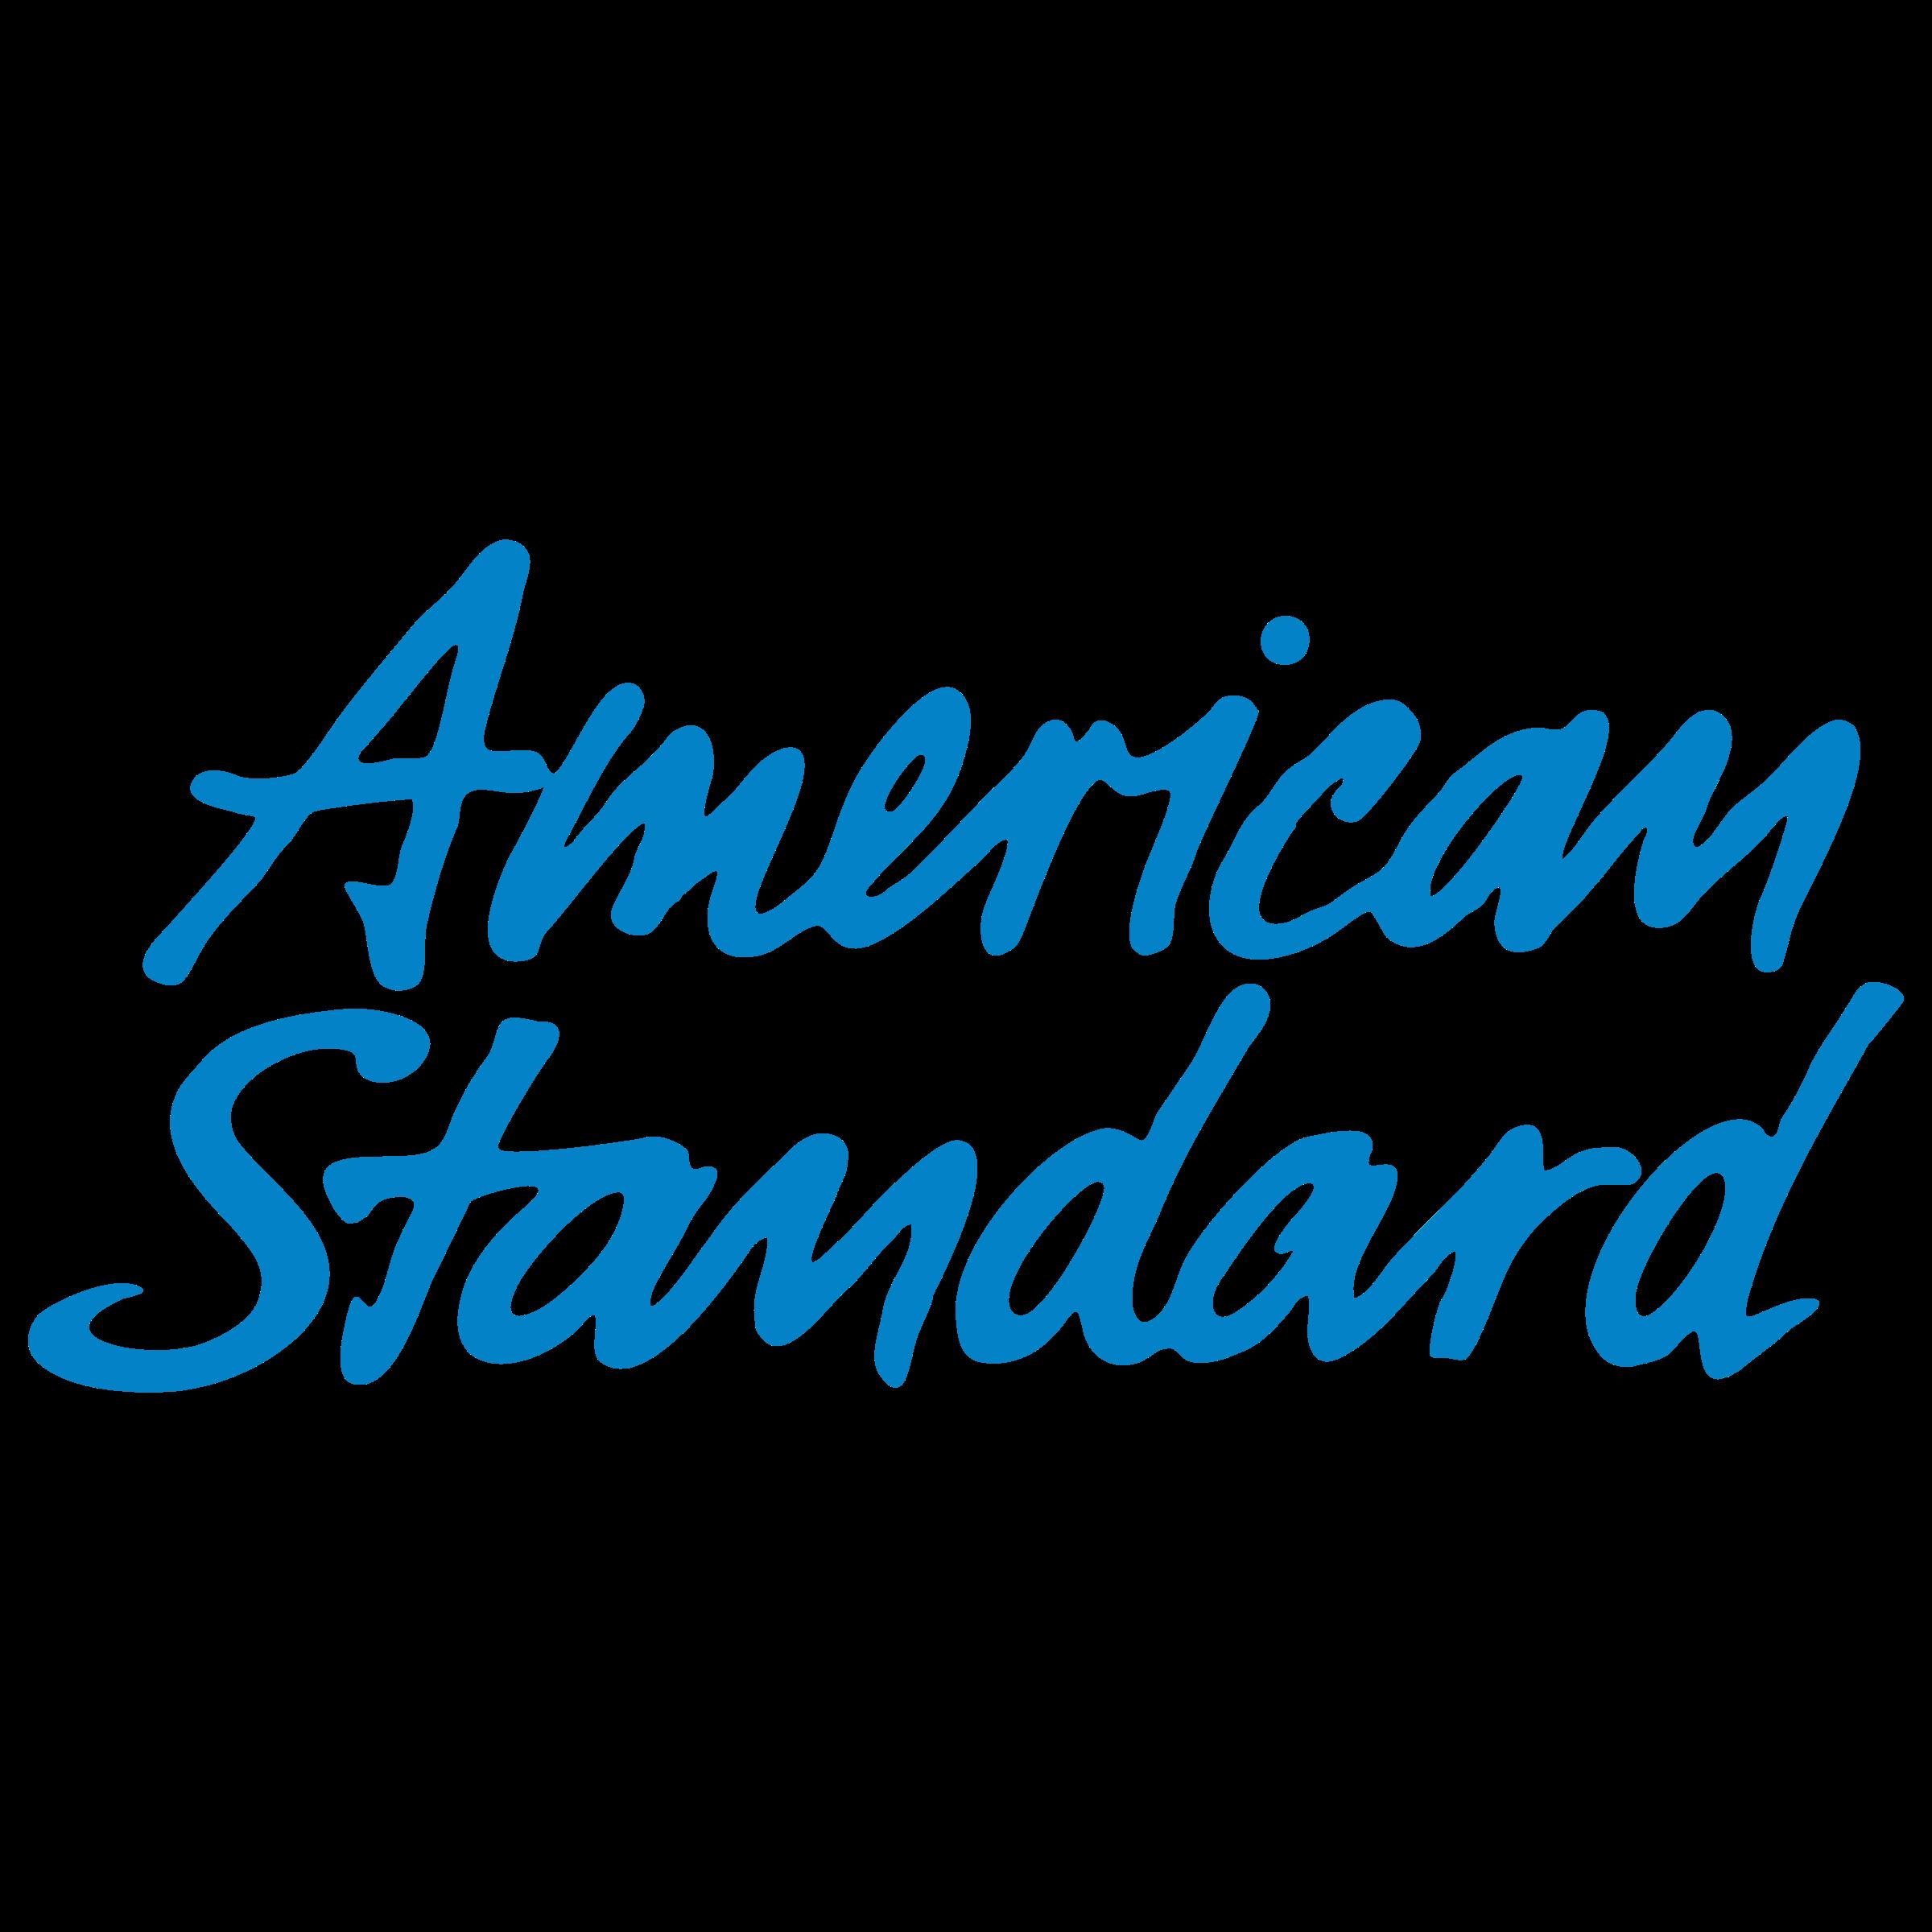 American Standard 02 Logo PNG Transparent & SVG Vector - Freebie Supply